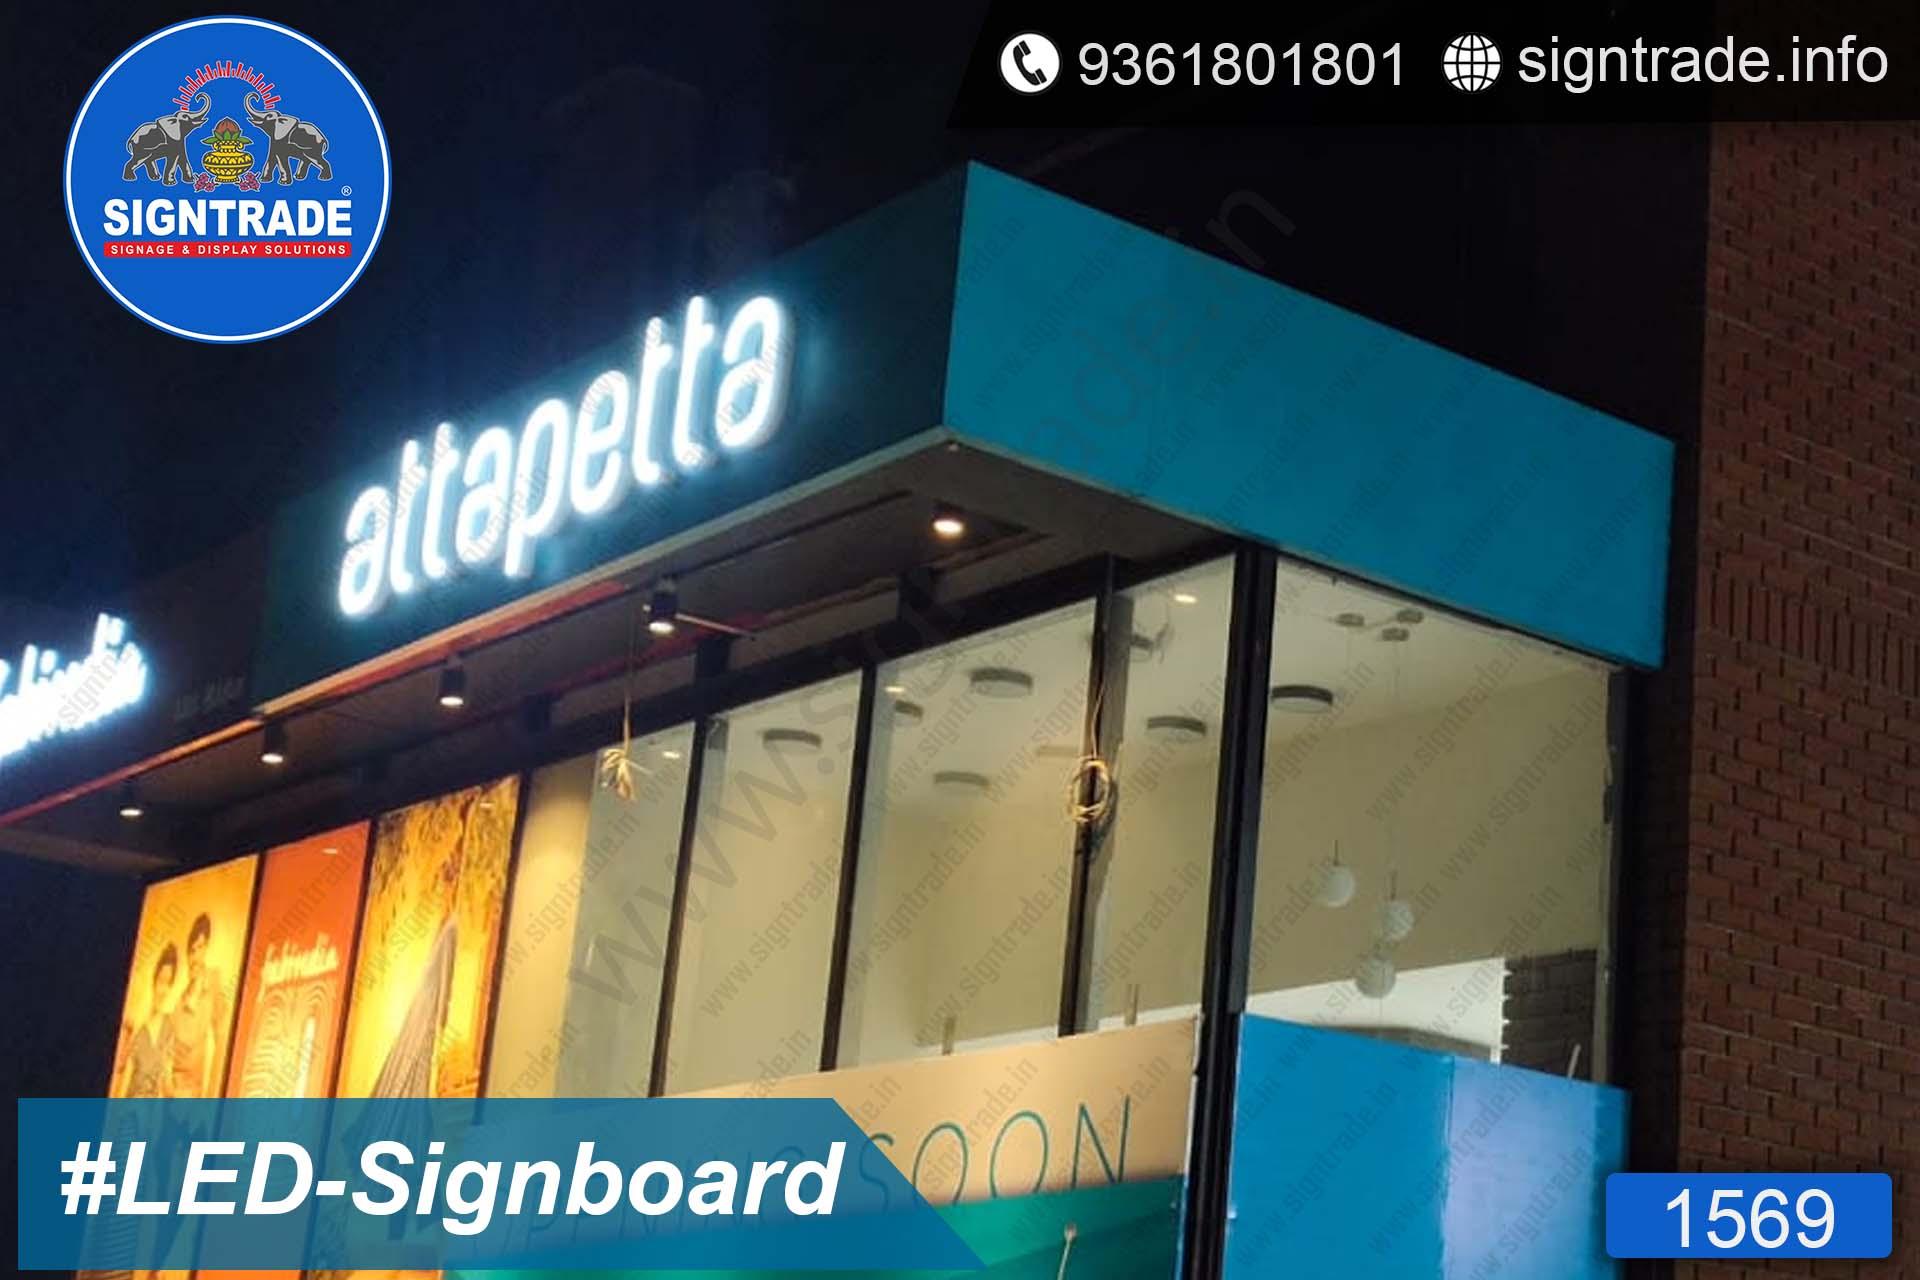 Attapetta, ECR, Chennai - SIGNTRADE - Acrylic, LED Sign Board Manufacturers in Chennai